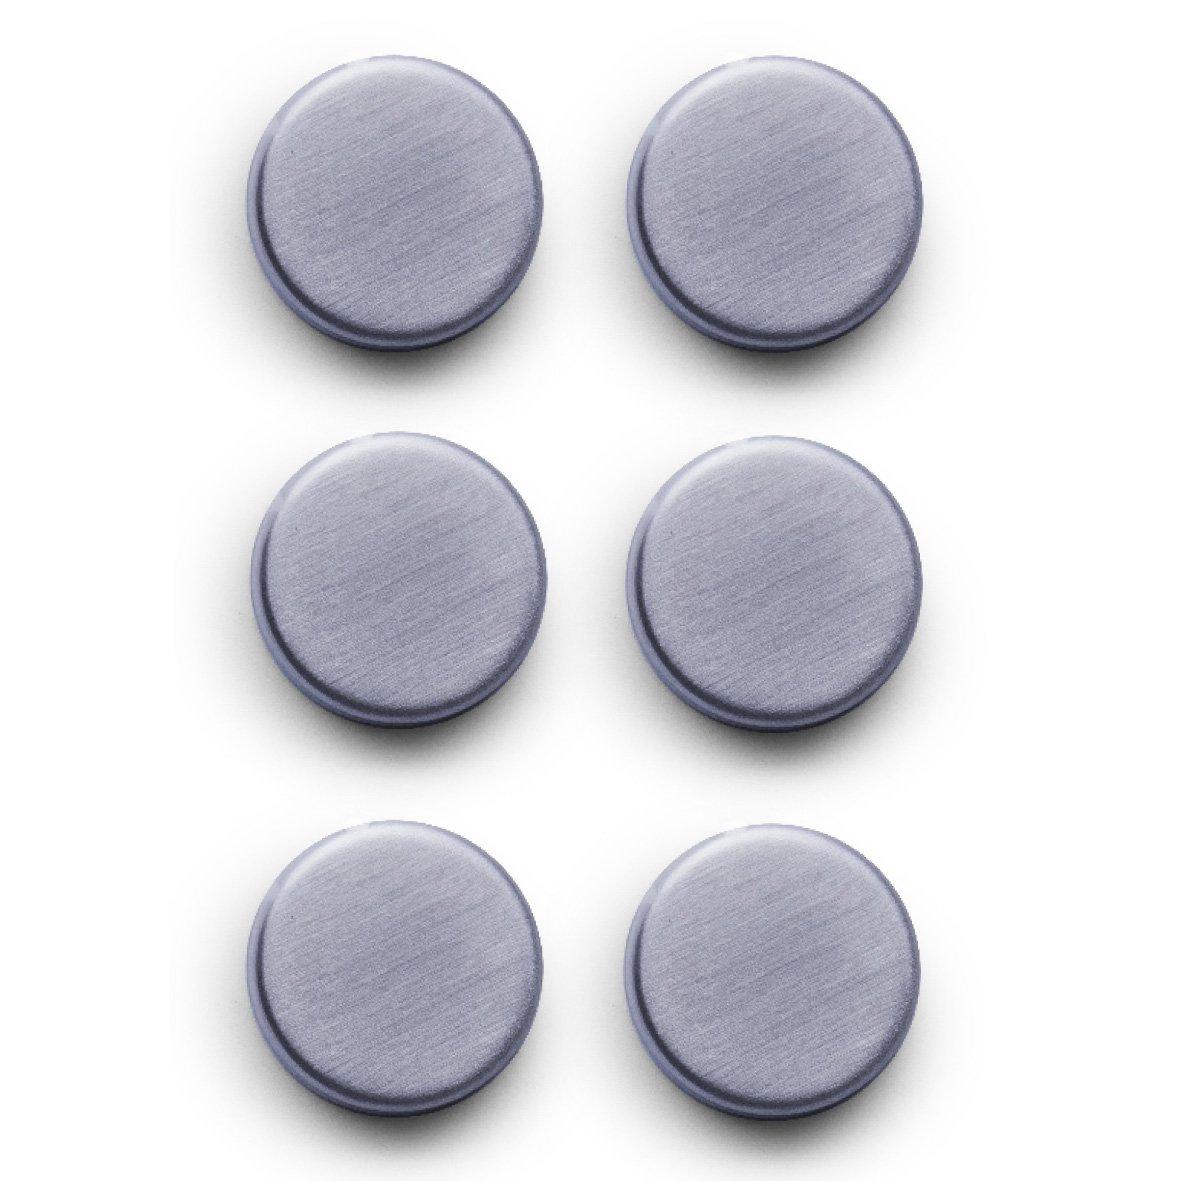 Amazon.de: Zeller 11203 Magnet-Set 6-teilig, Ø 2.7 cm, edelstahl